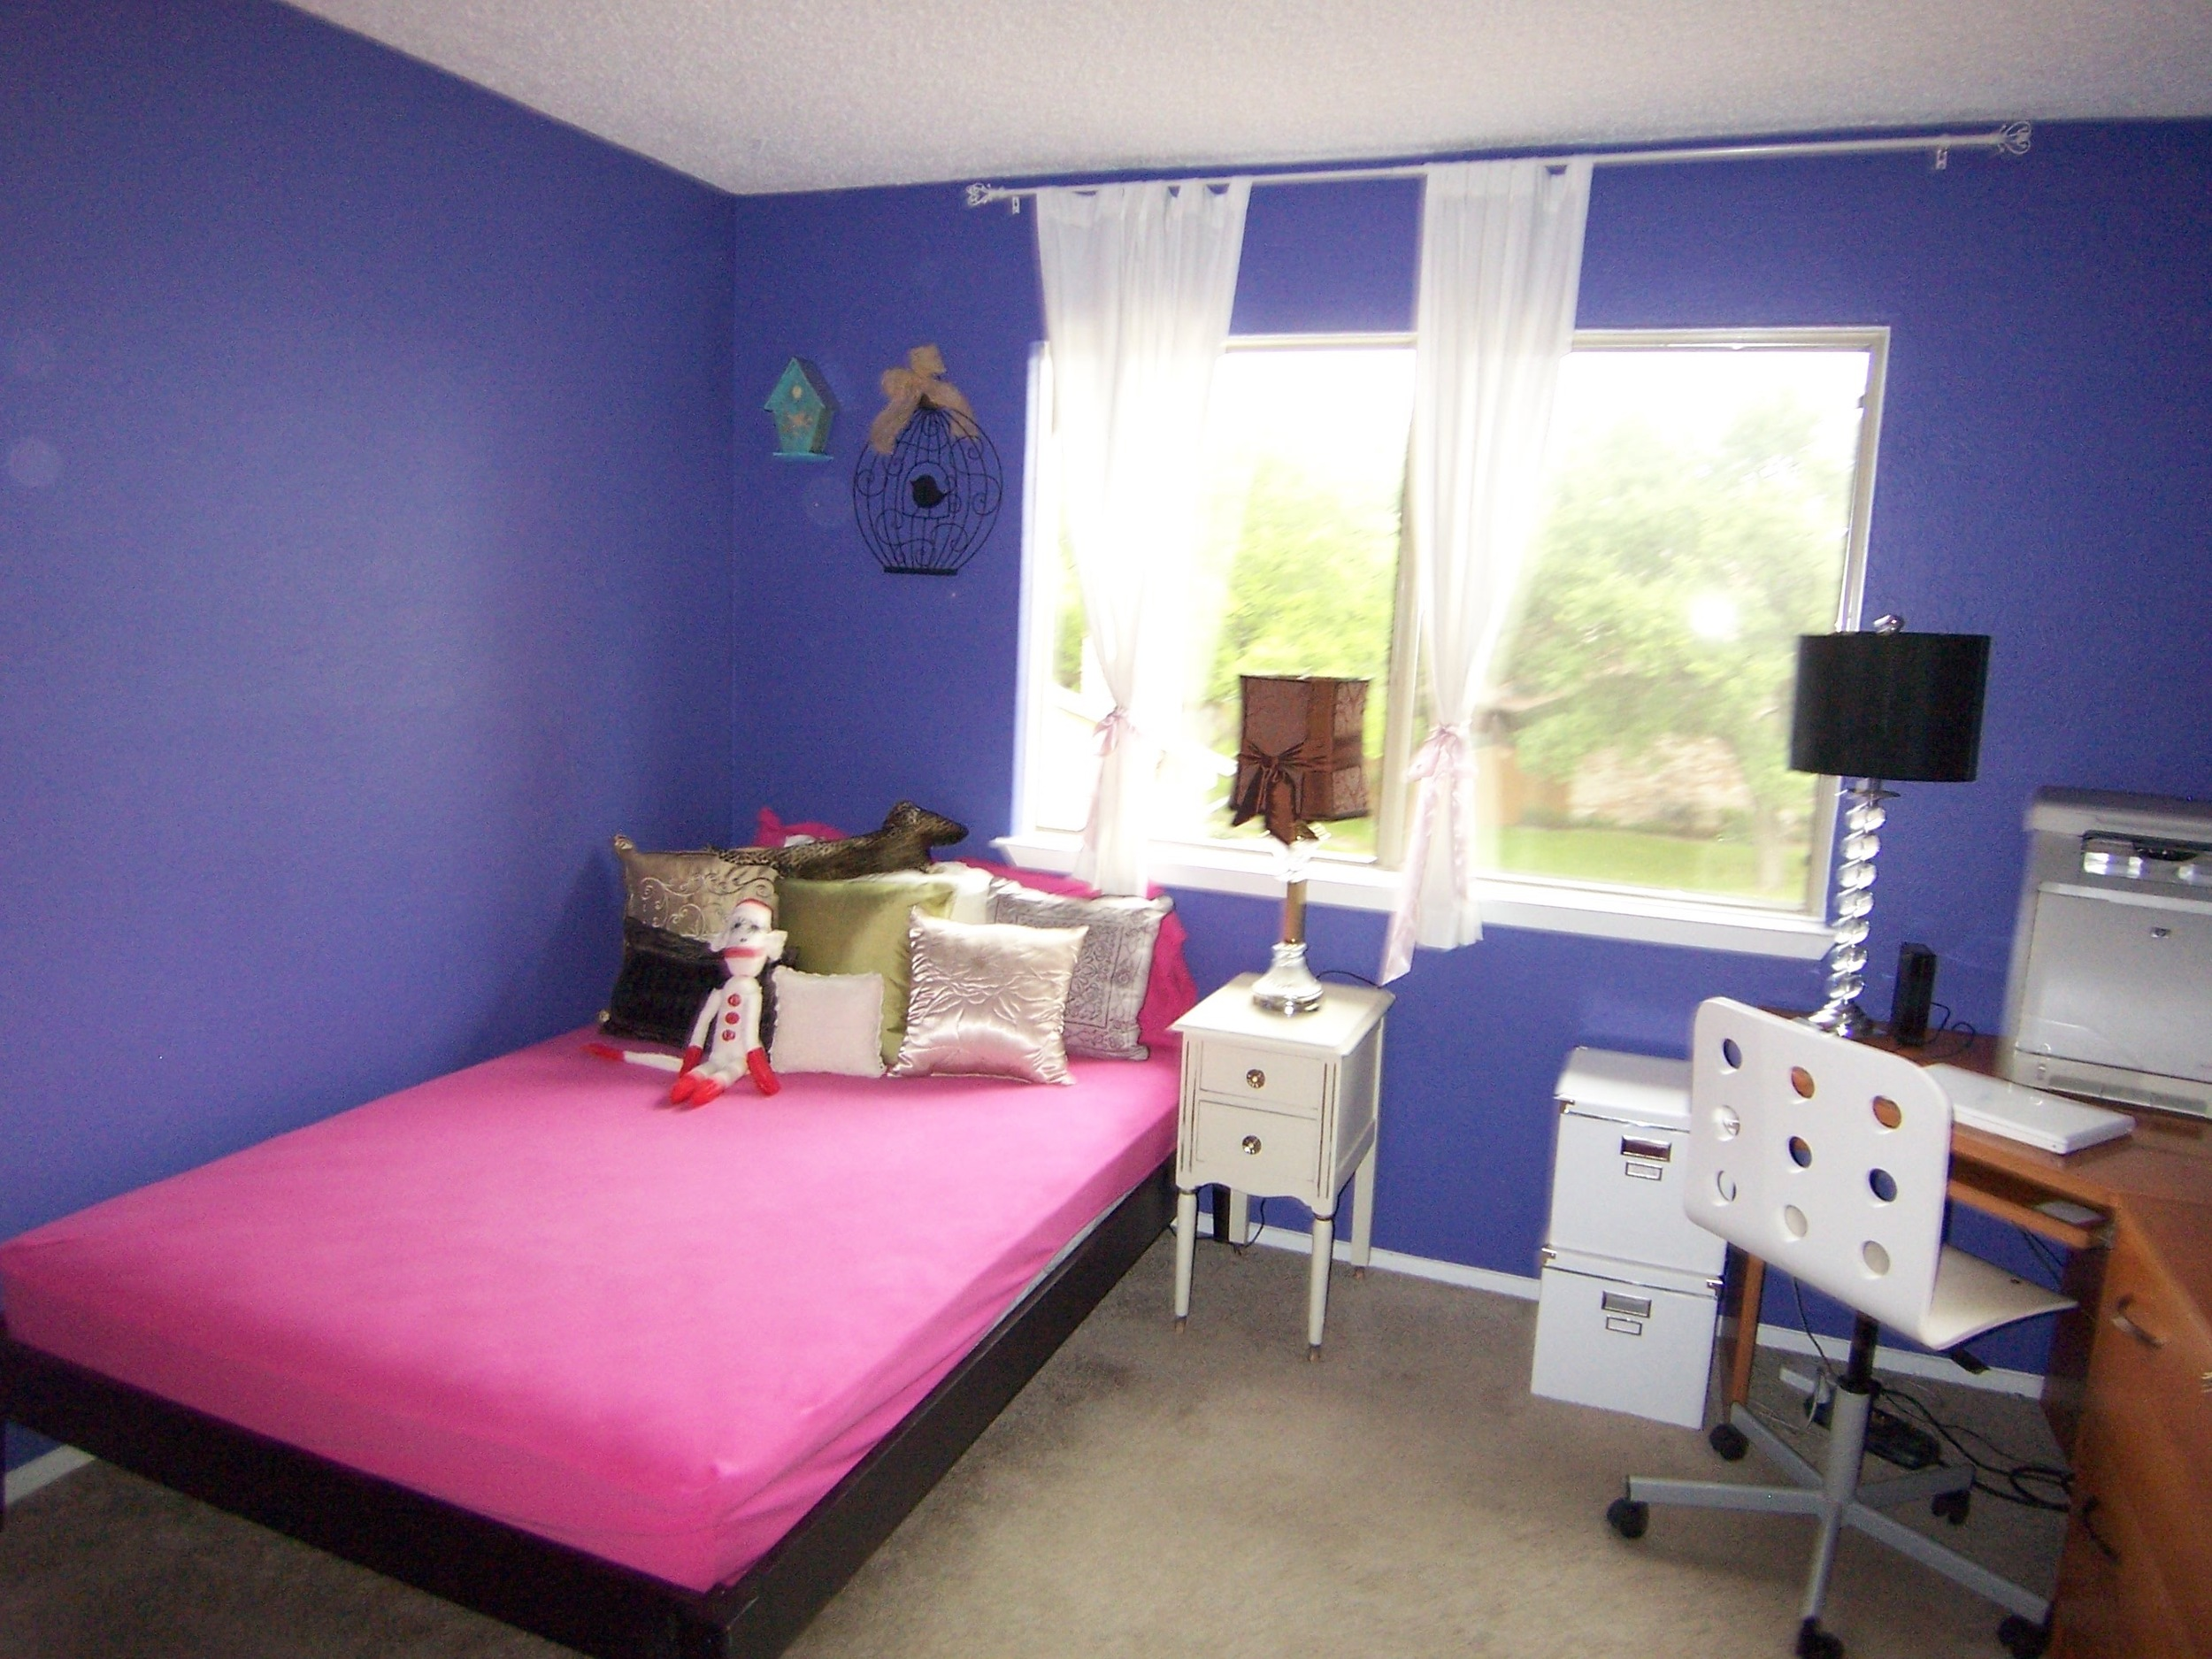 Austin+townhouse+guest+room.jpg